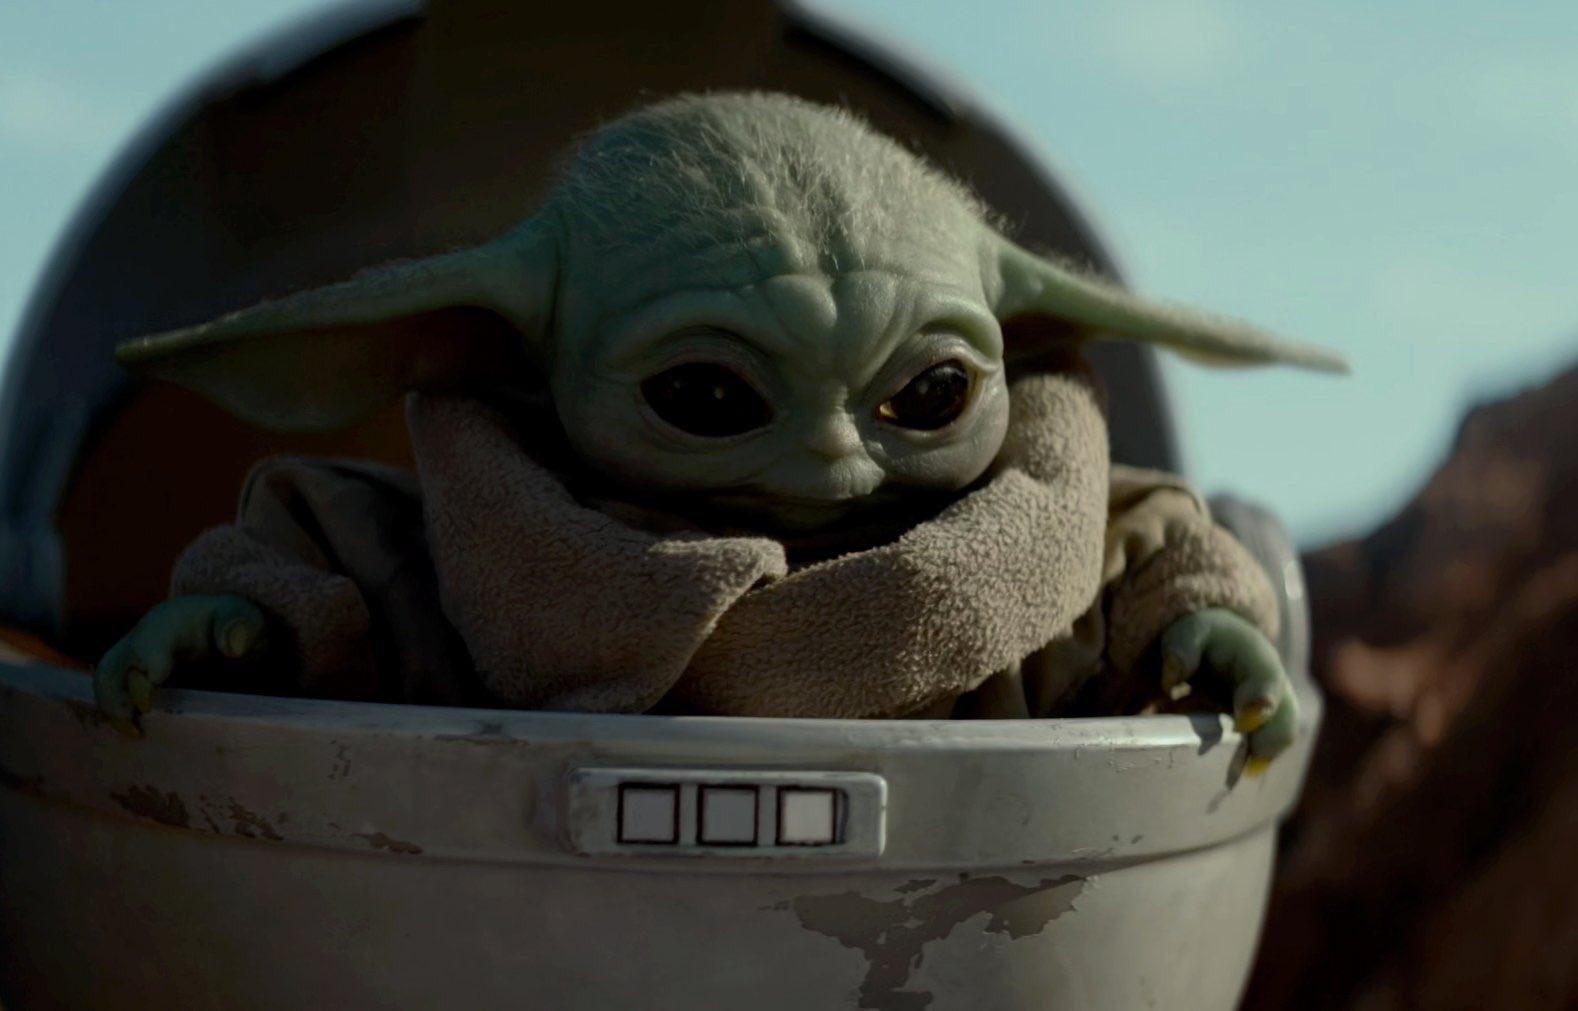 Baby Yoda Lego Star Wars Pfp Baby Yoda 1578x1011 Wallpaper Teahub Io